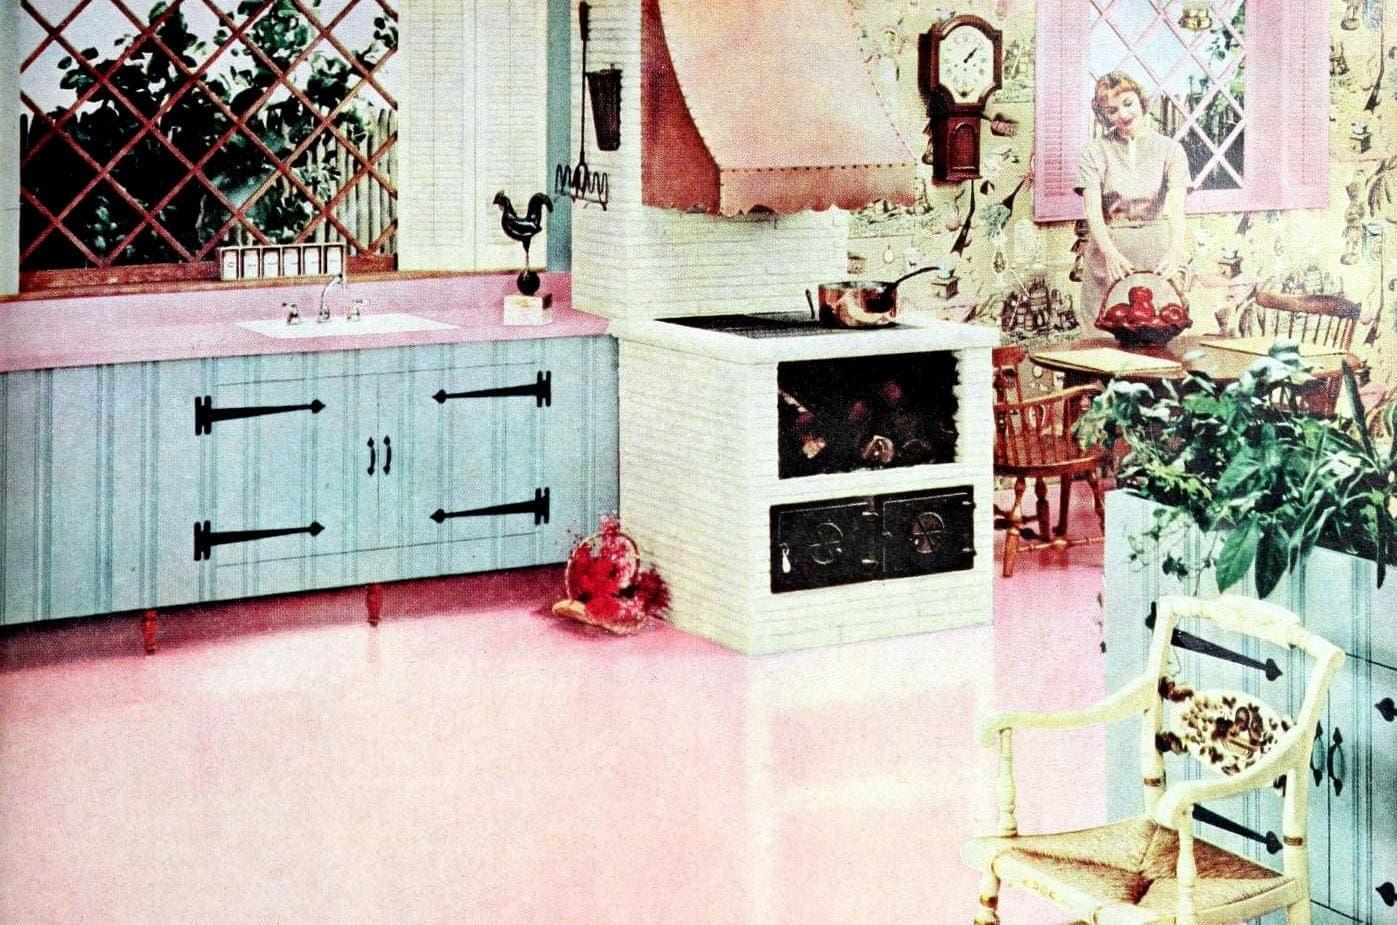 Retro pink kitchen - Vintage 50s home decor (3)